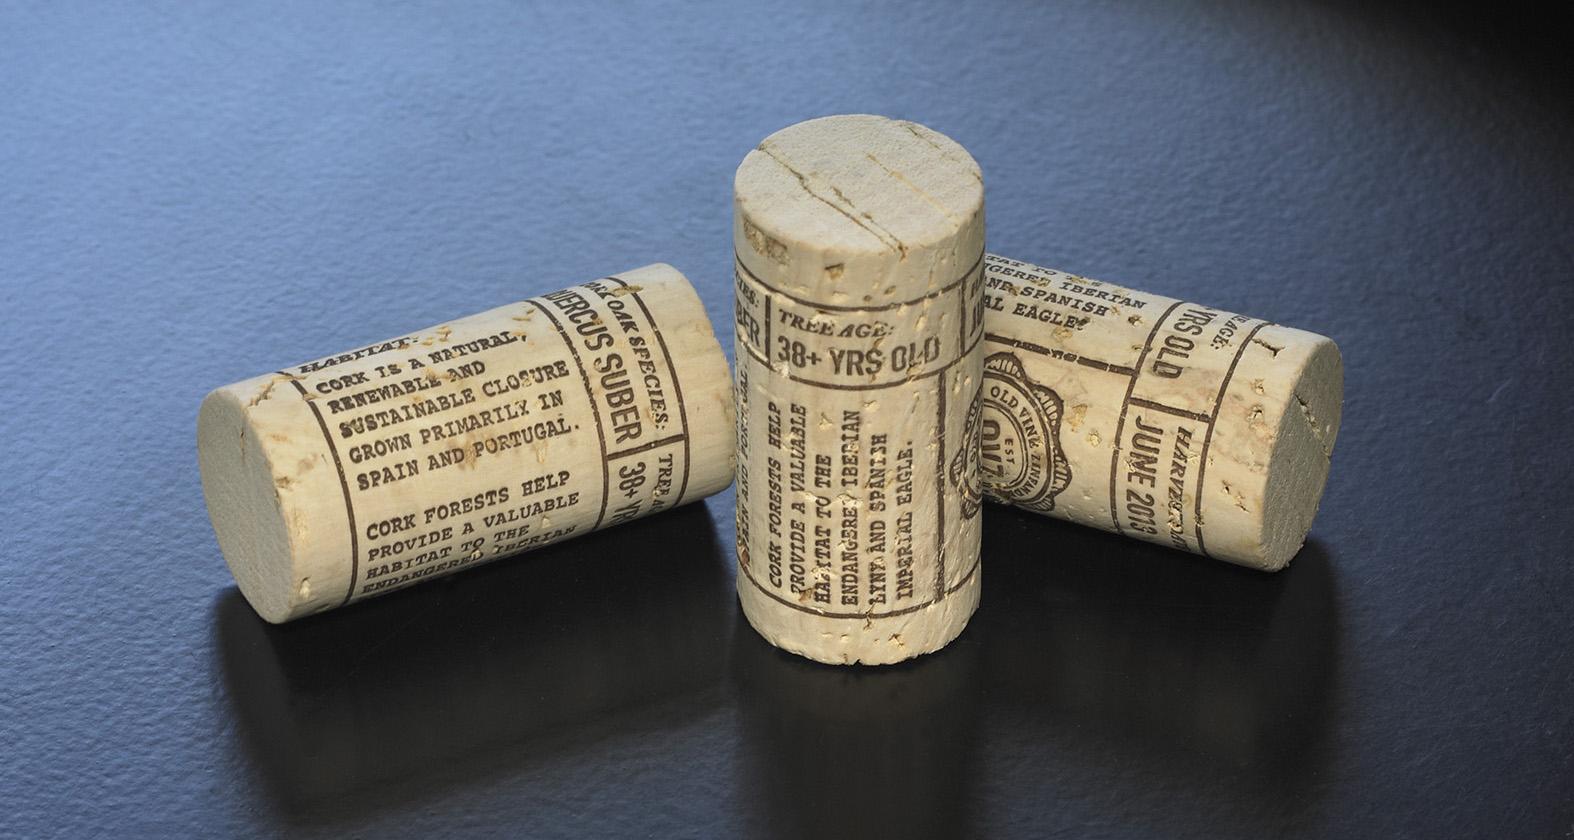 OV corks_cropped for web.jpg